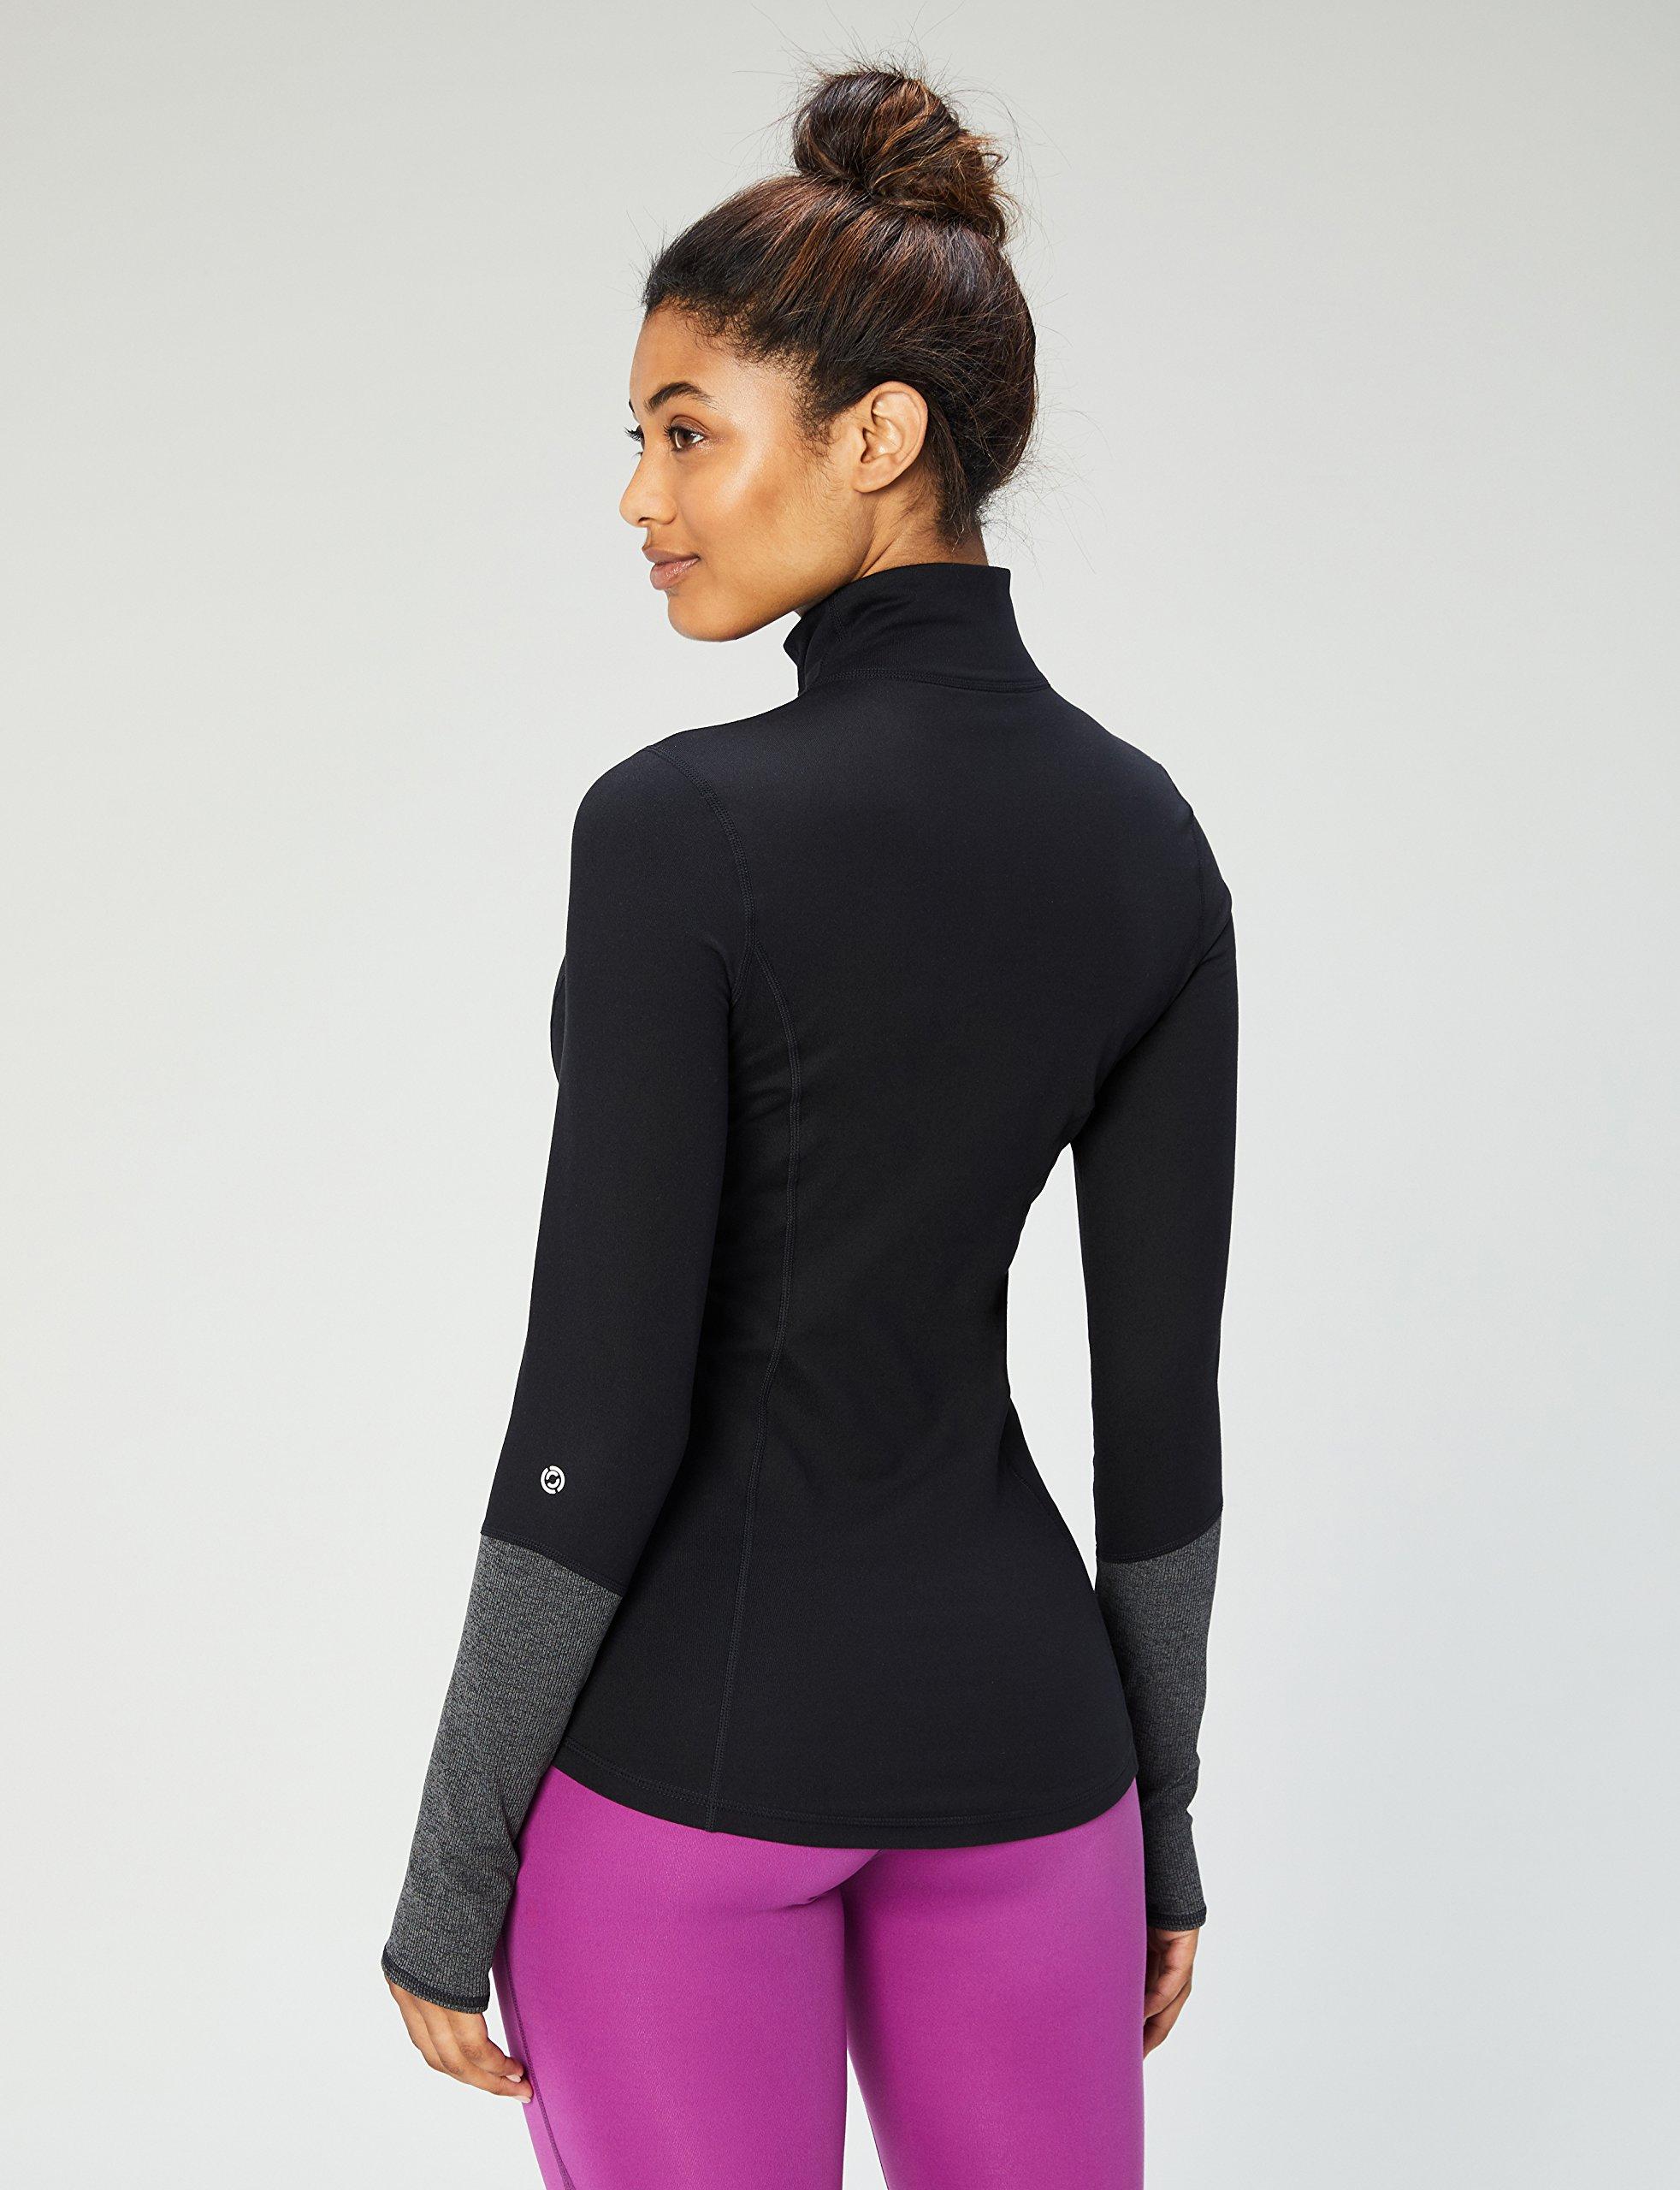 Core 10 Women's Icon Series - The Ballerina Full-Zip Jacket, Black, Medium by Core 10 (Image #3)